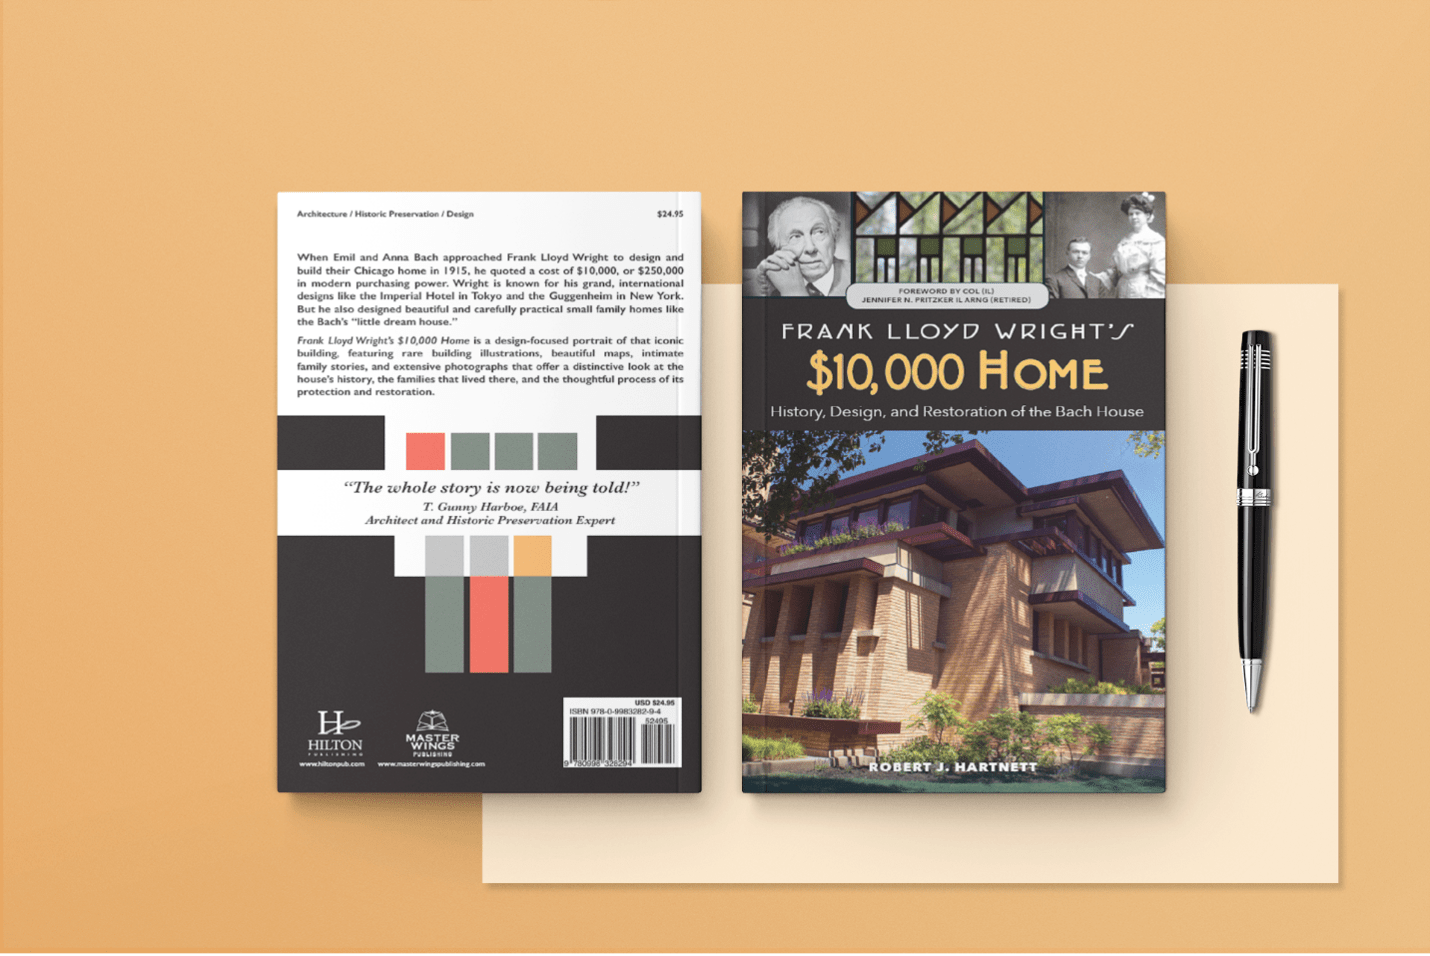 Frank Lloyd Wright book $10,000 home